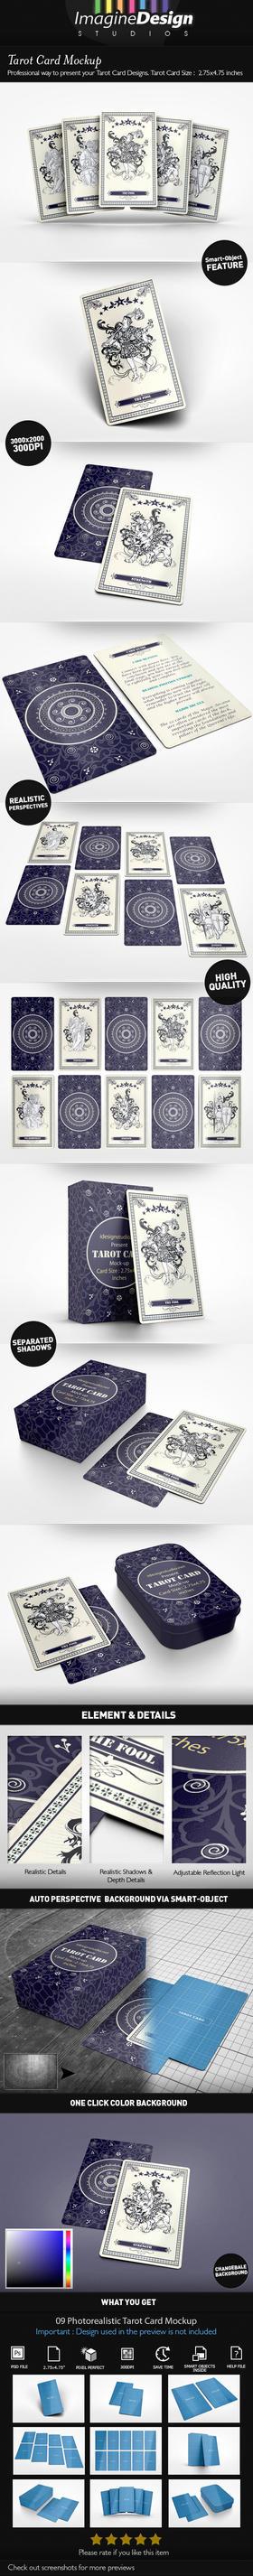 Tarot Card Mockup by idesignstudio